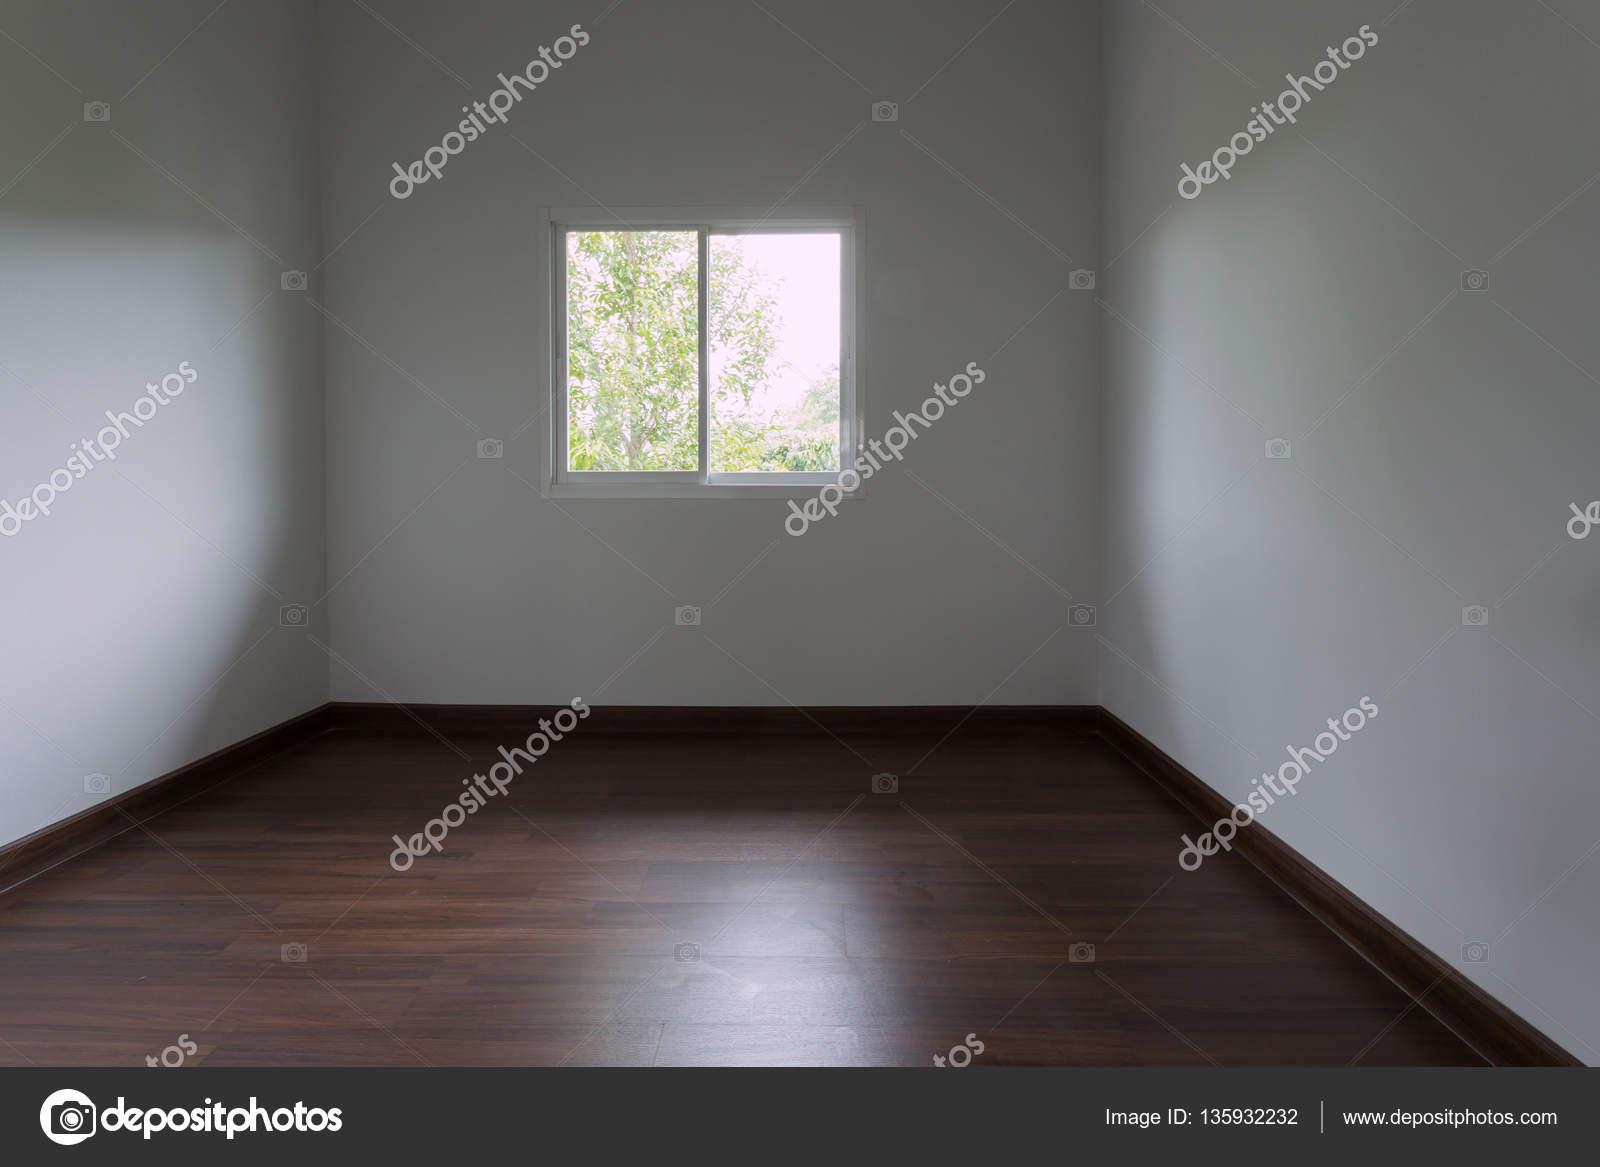 leeren Raum Innenarchitektur — Stockfoto © Sutichak #135932232